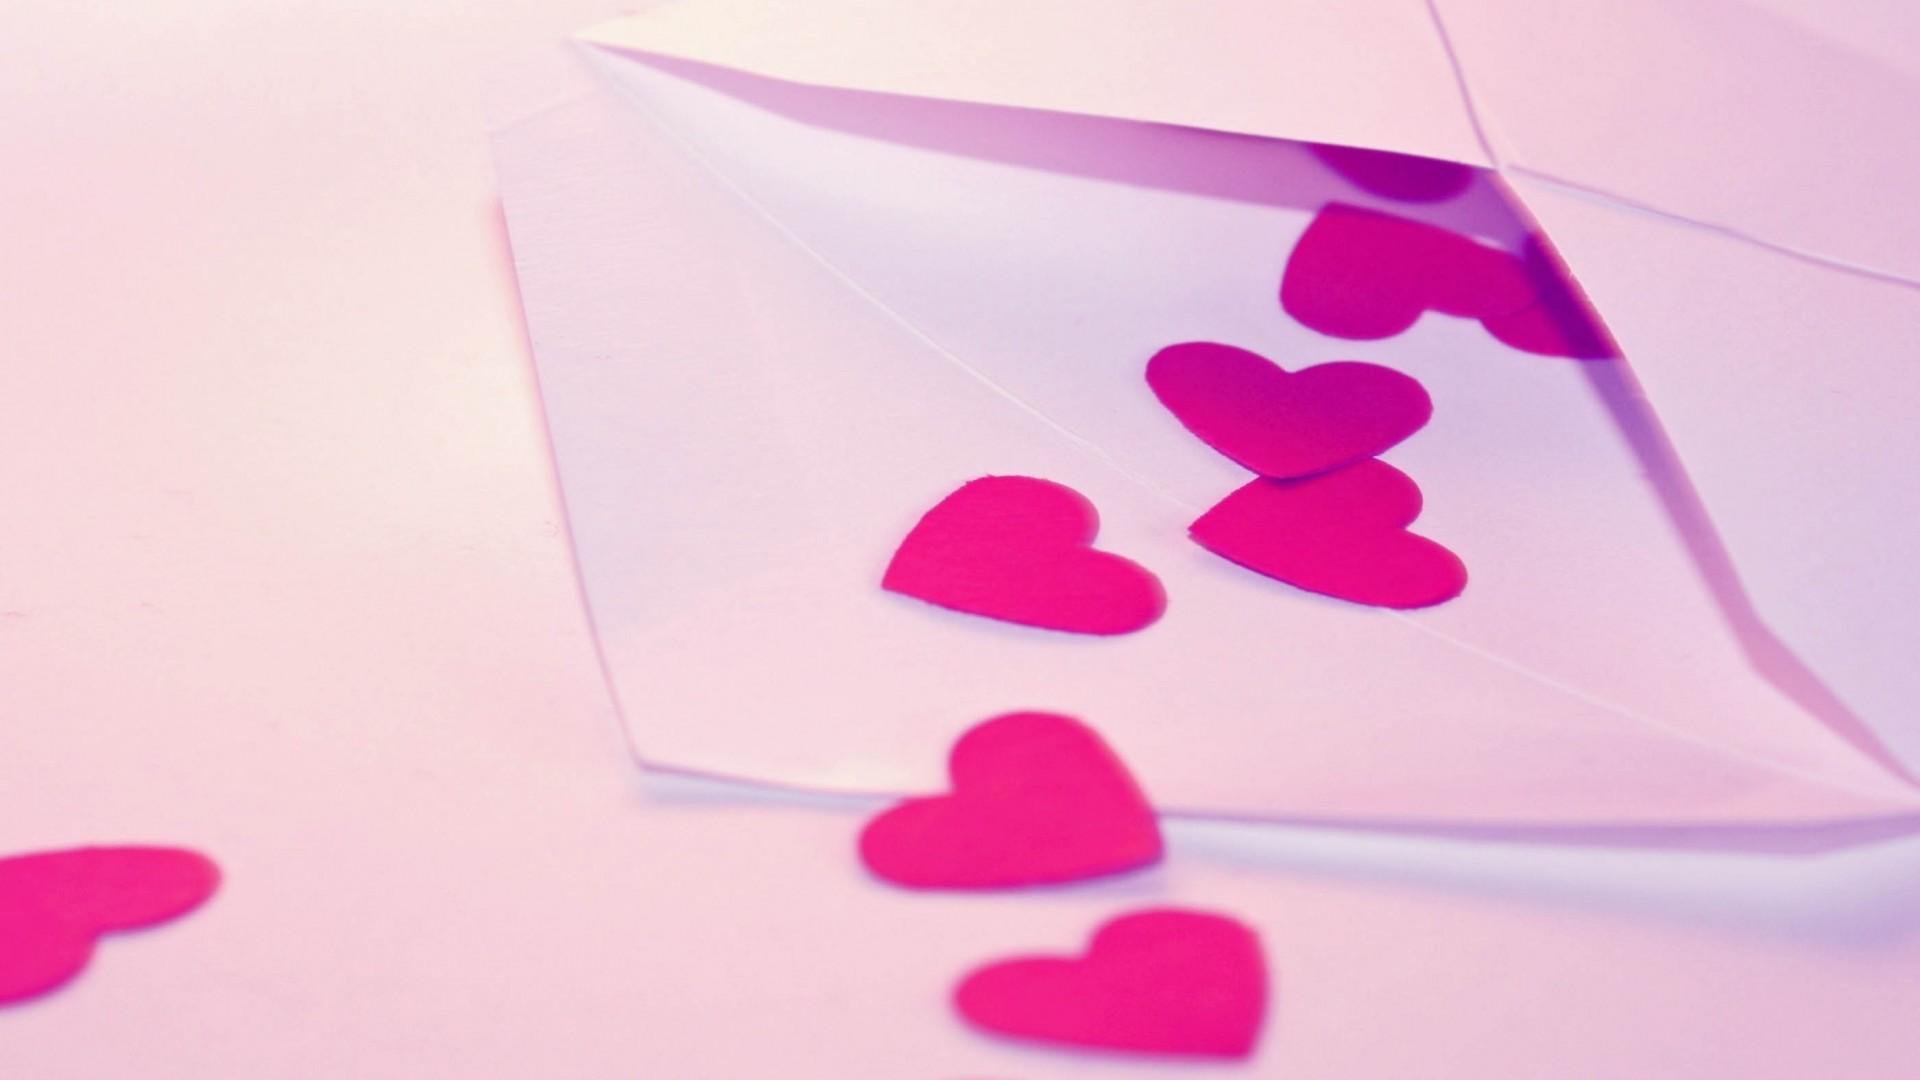 Cute Love Desktop Wallpapers 1920x1080